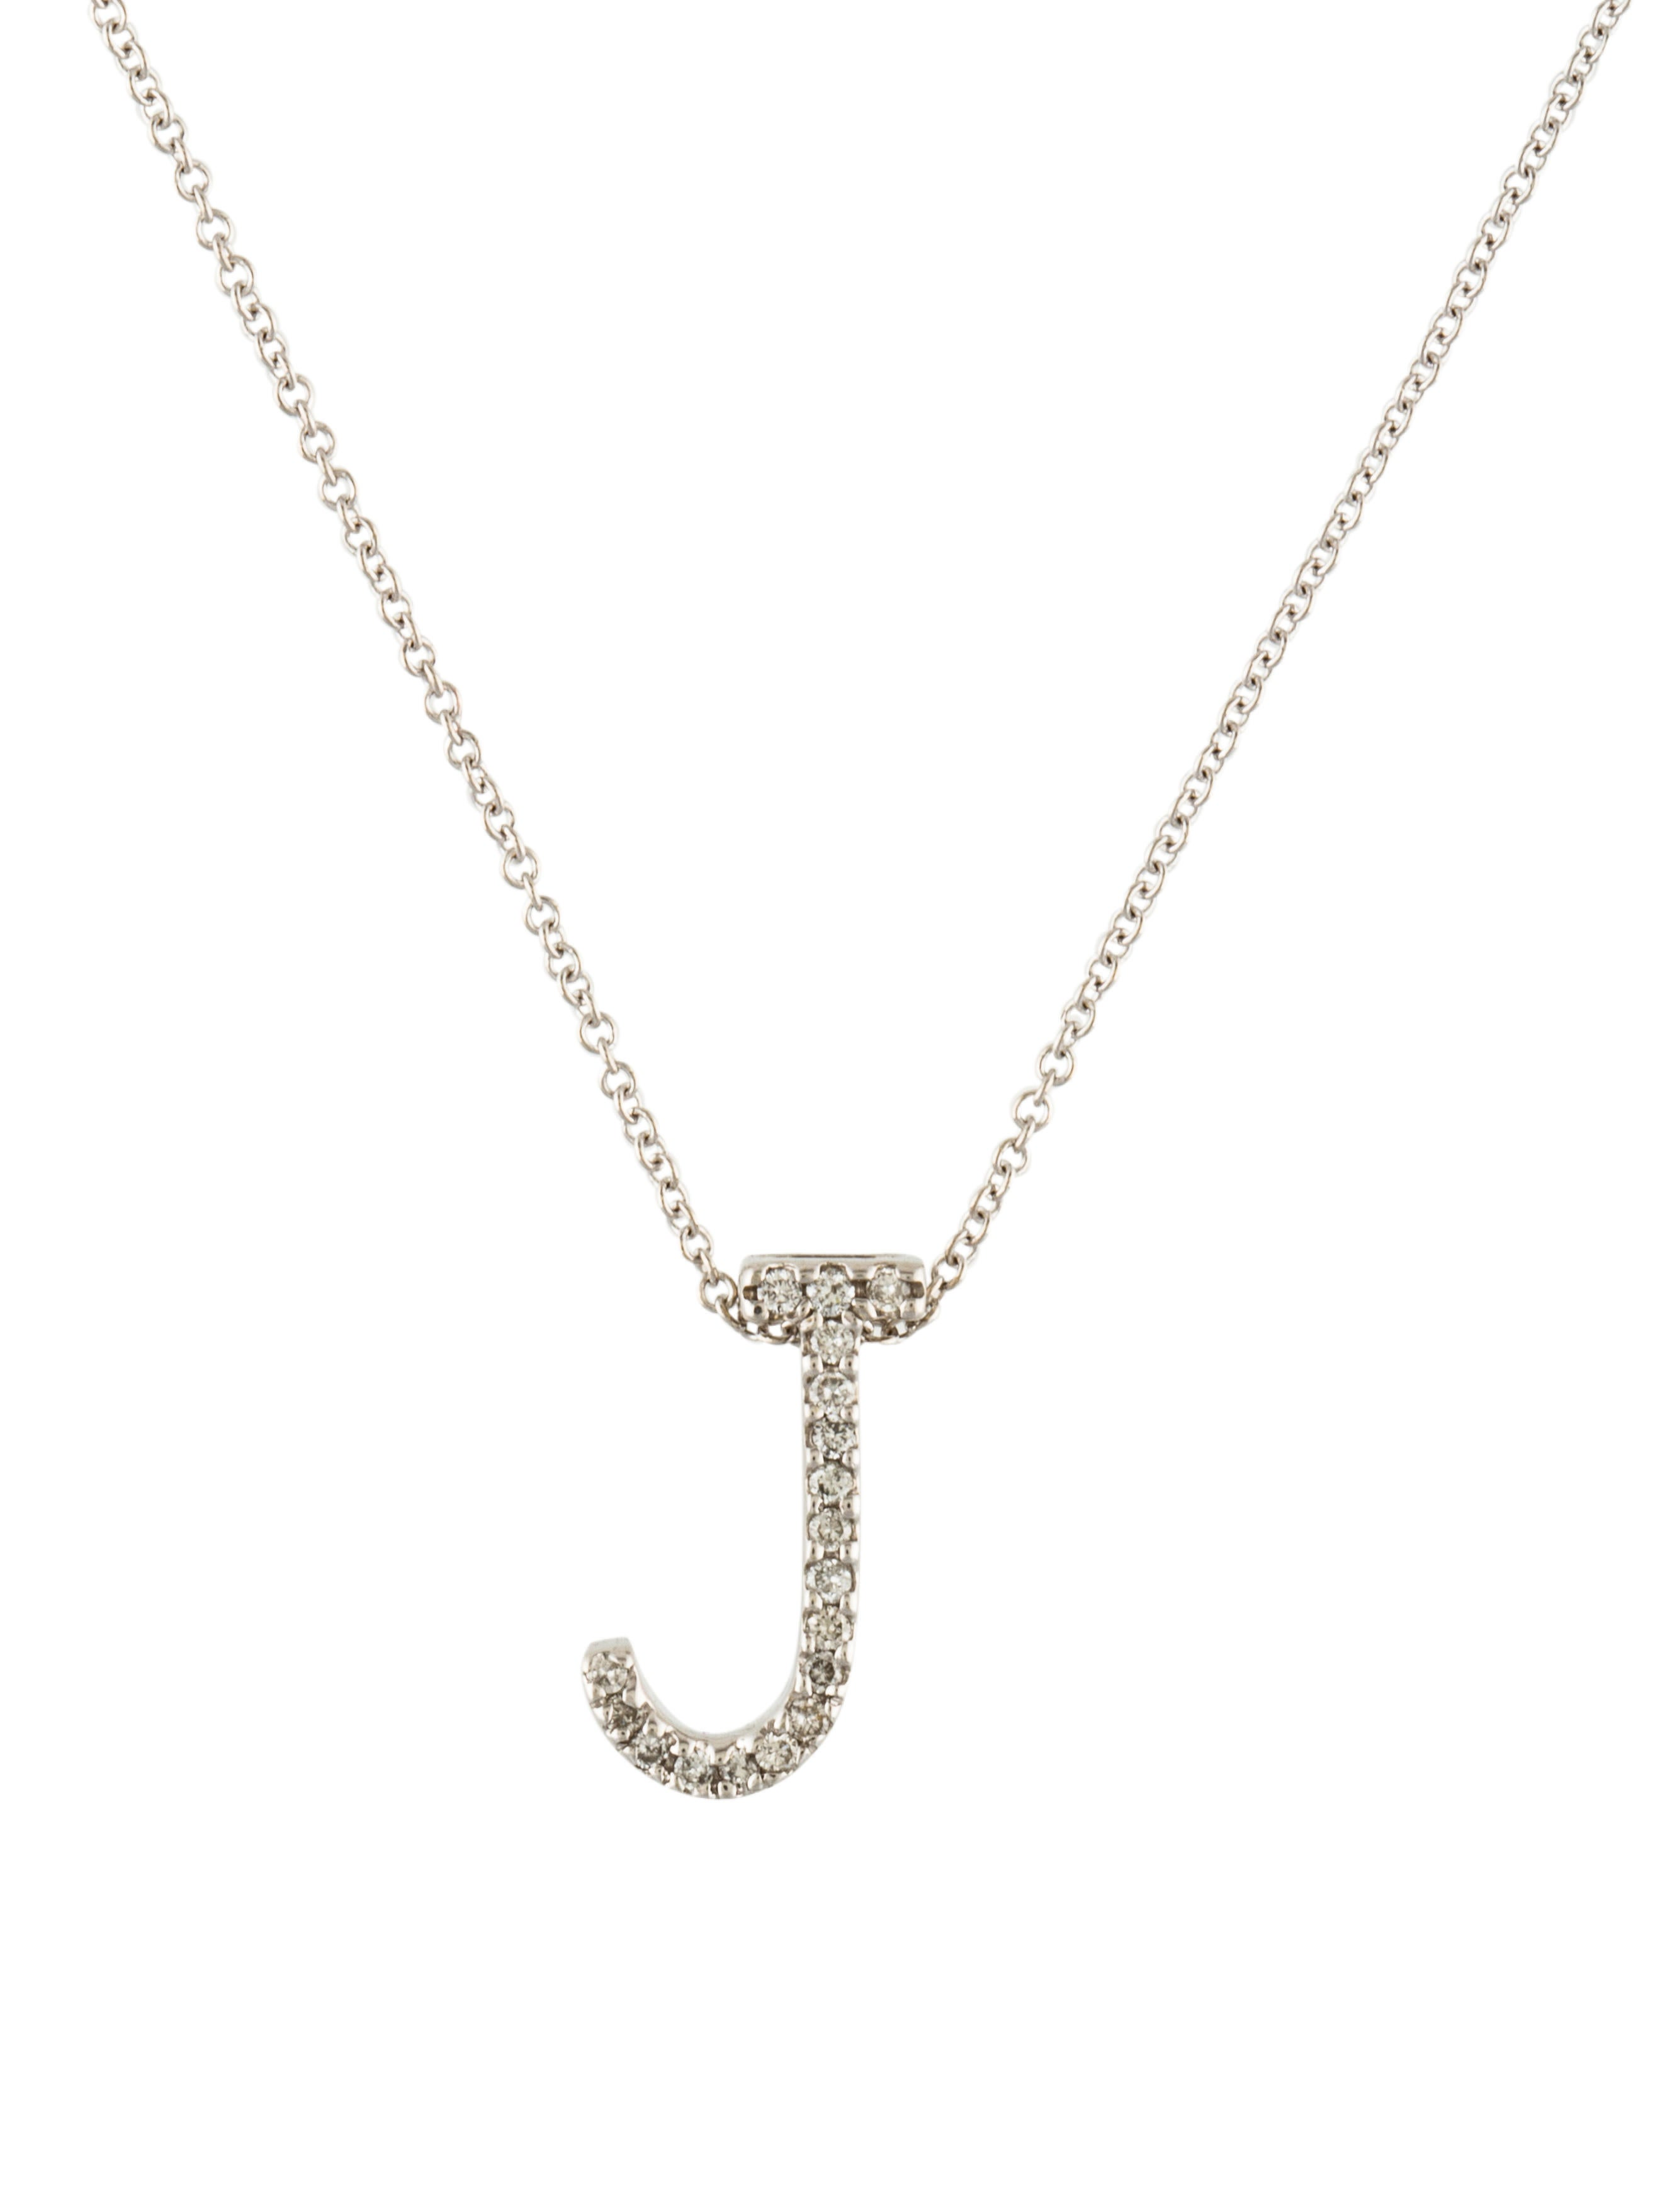 14k diamond j initial pendant necklace necklaces neckl37394 14k diamond j initial pendant aloadofball Image collections